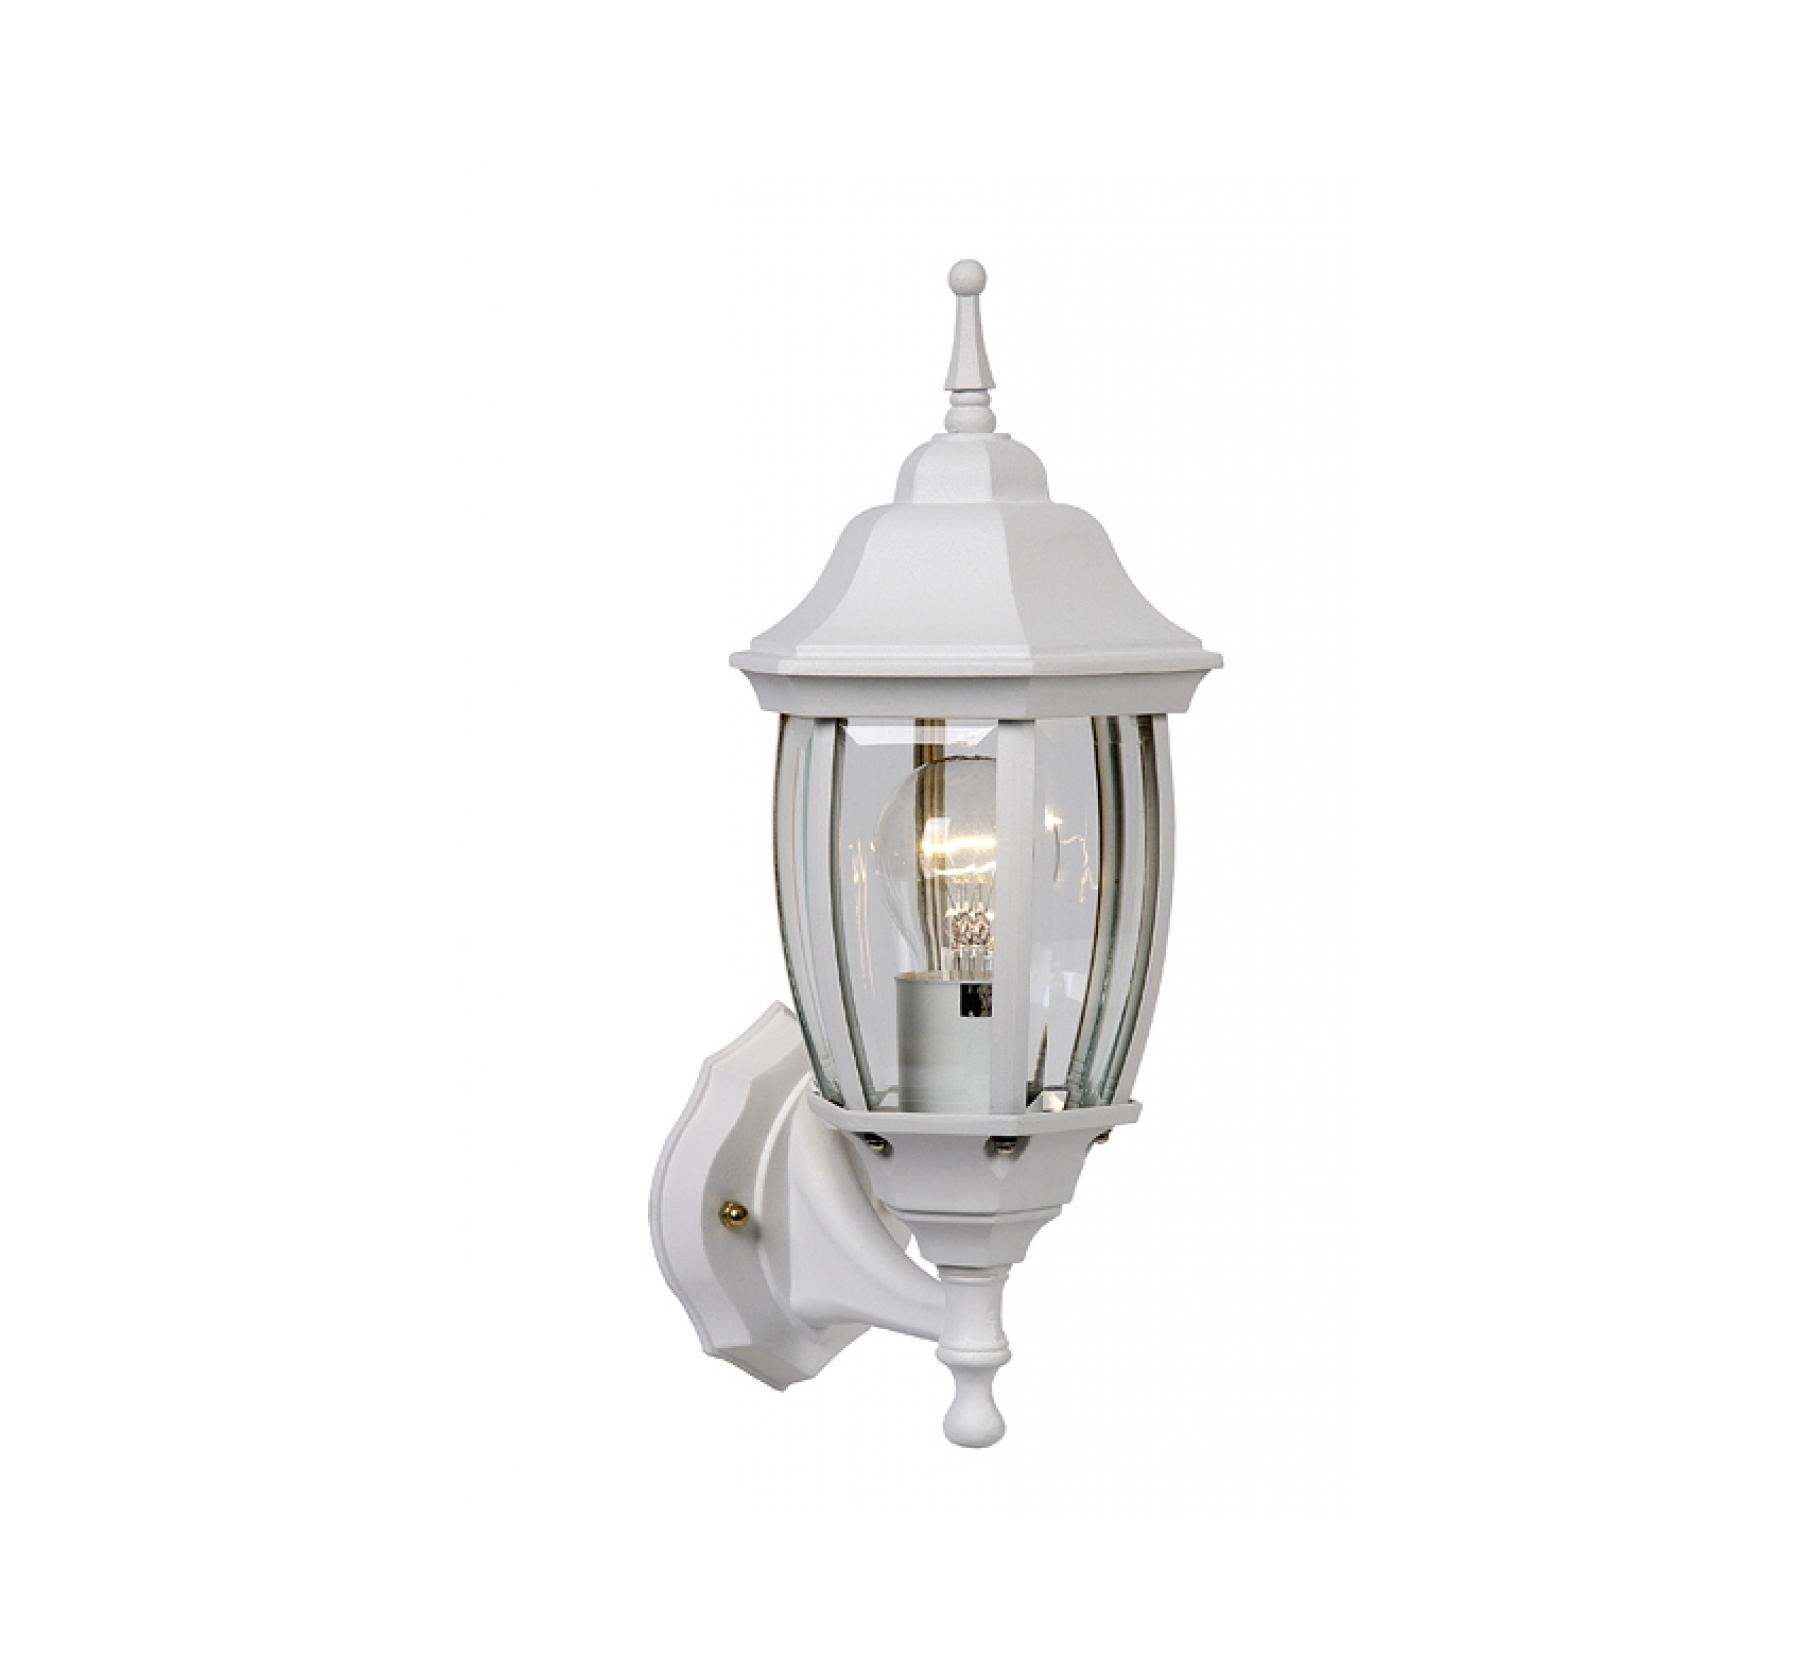 Настенный светильник TIRENOУличные настенные светильники<br>Цоколь: E27,&amp;lt;div&amp;gt;Мощность: 60W,&amp;lt;/div&amp;gt;&amp;lt;div&amp;gt;Количество: 1 лампочка (в комплект не входит)&amp;lt;/div&amp;gt;<br><br>Material: Металл<br>Width см: 20<br>Depth см: 16,5<br>Height см: 37